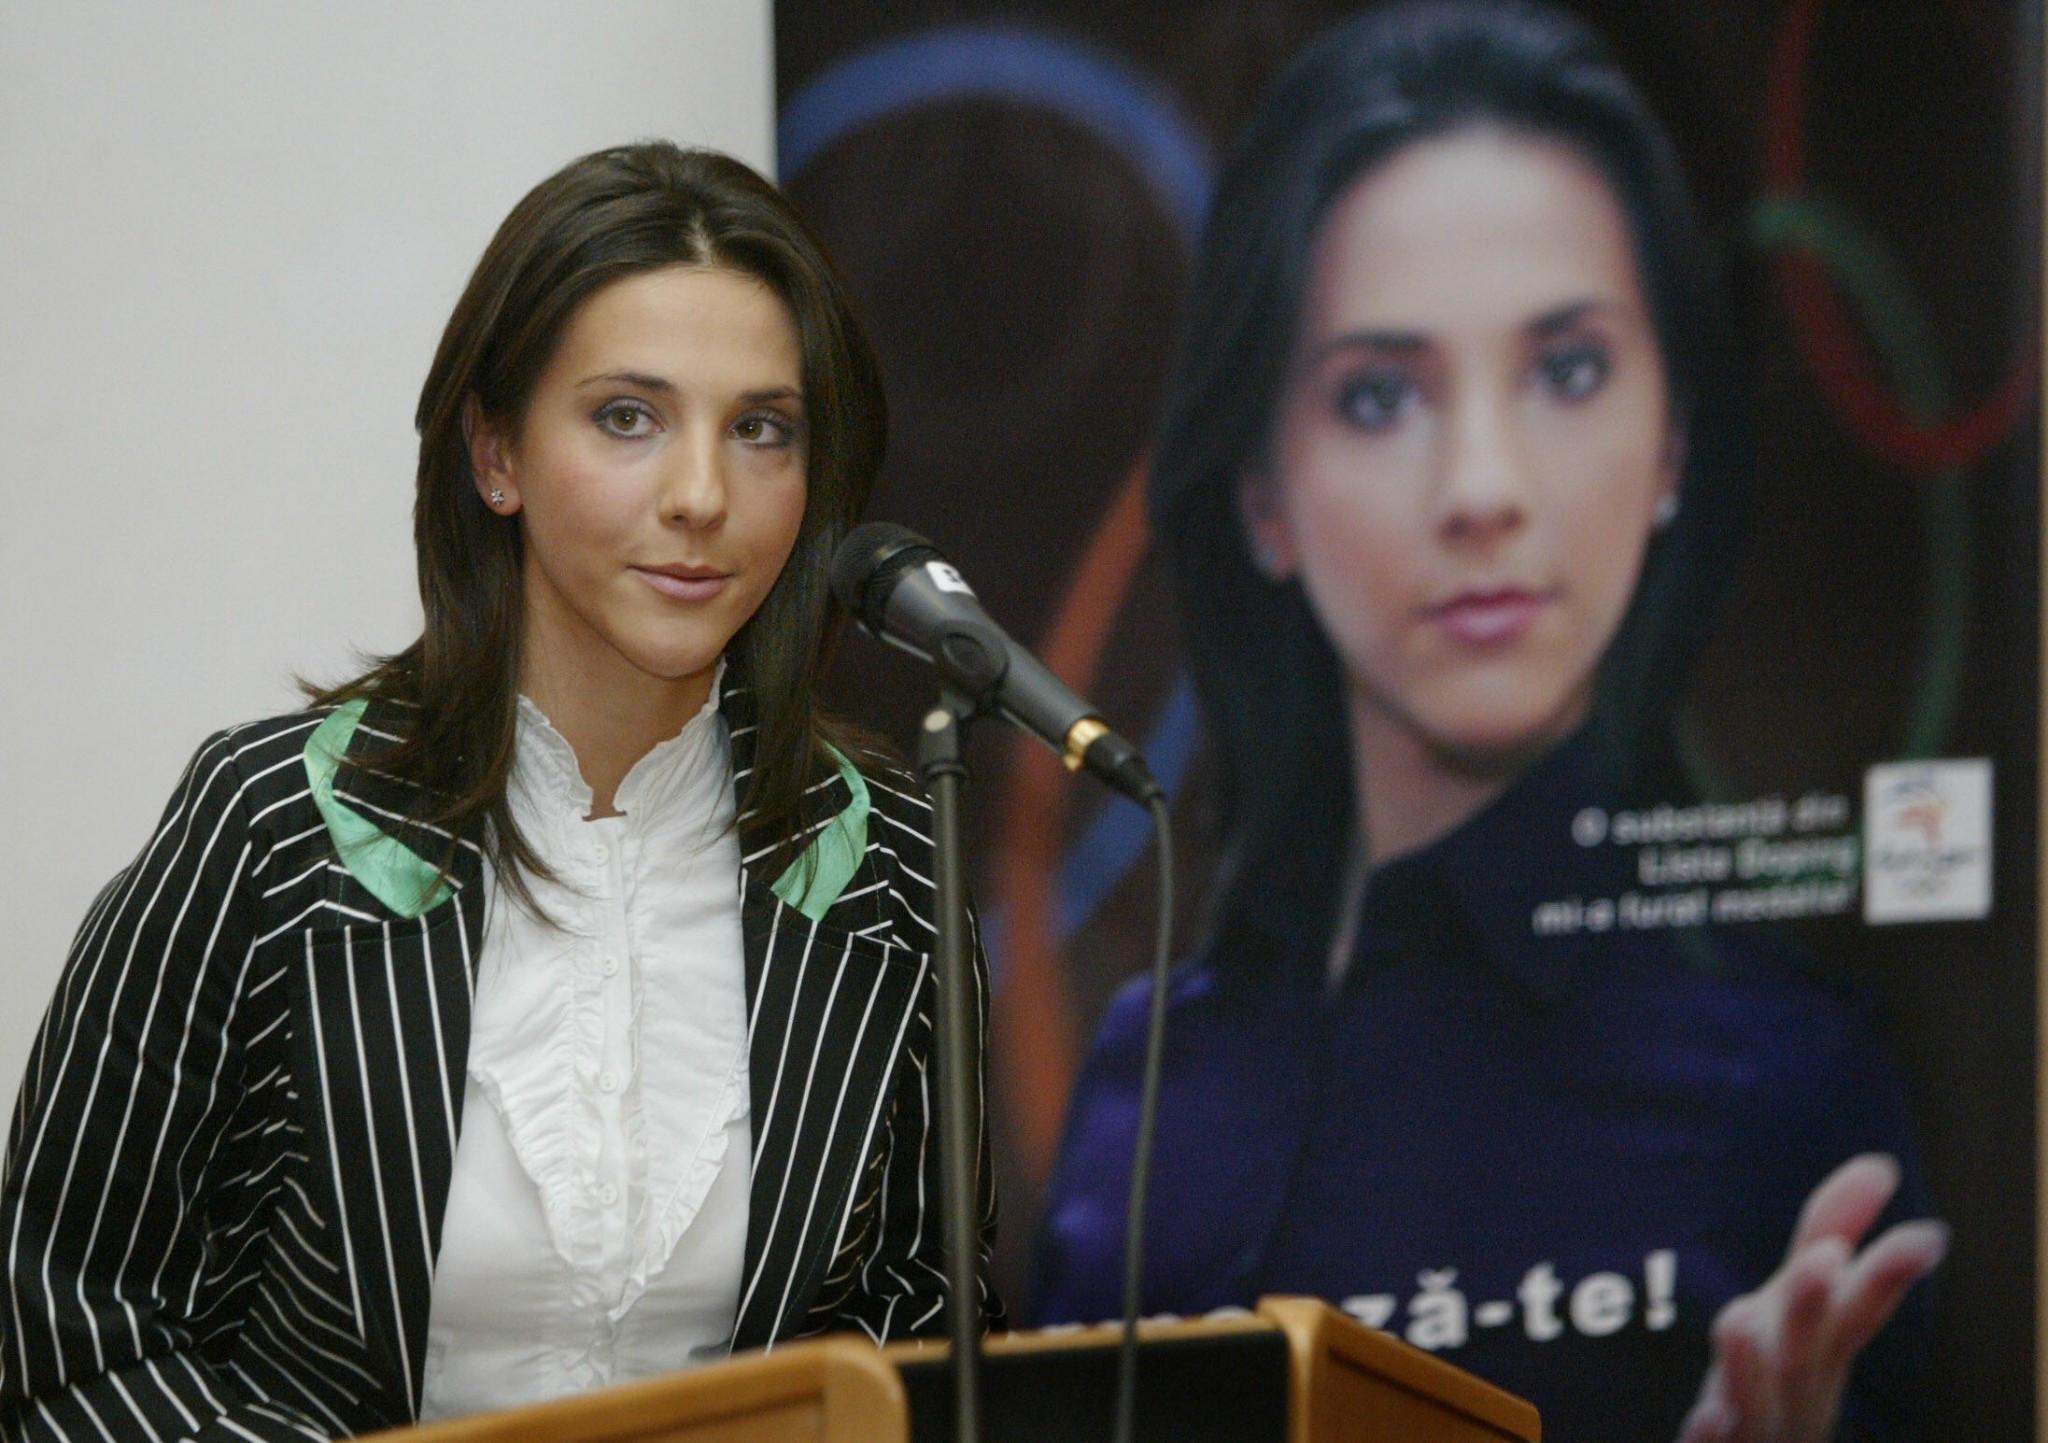 Sydney 2000 gold medallist elected President of Romanian Gymnastics Federation